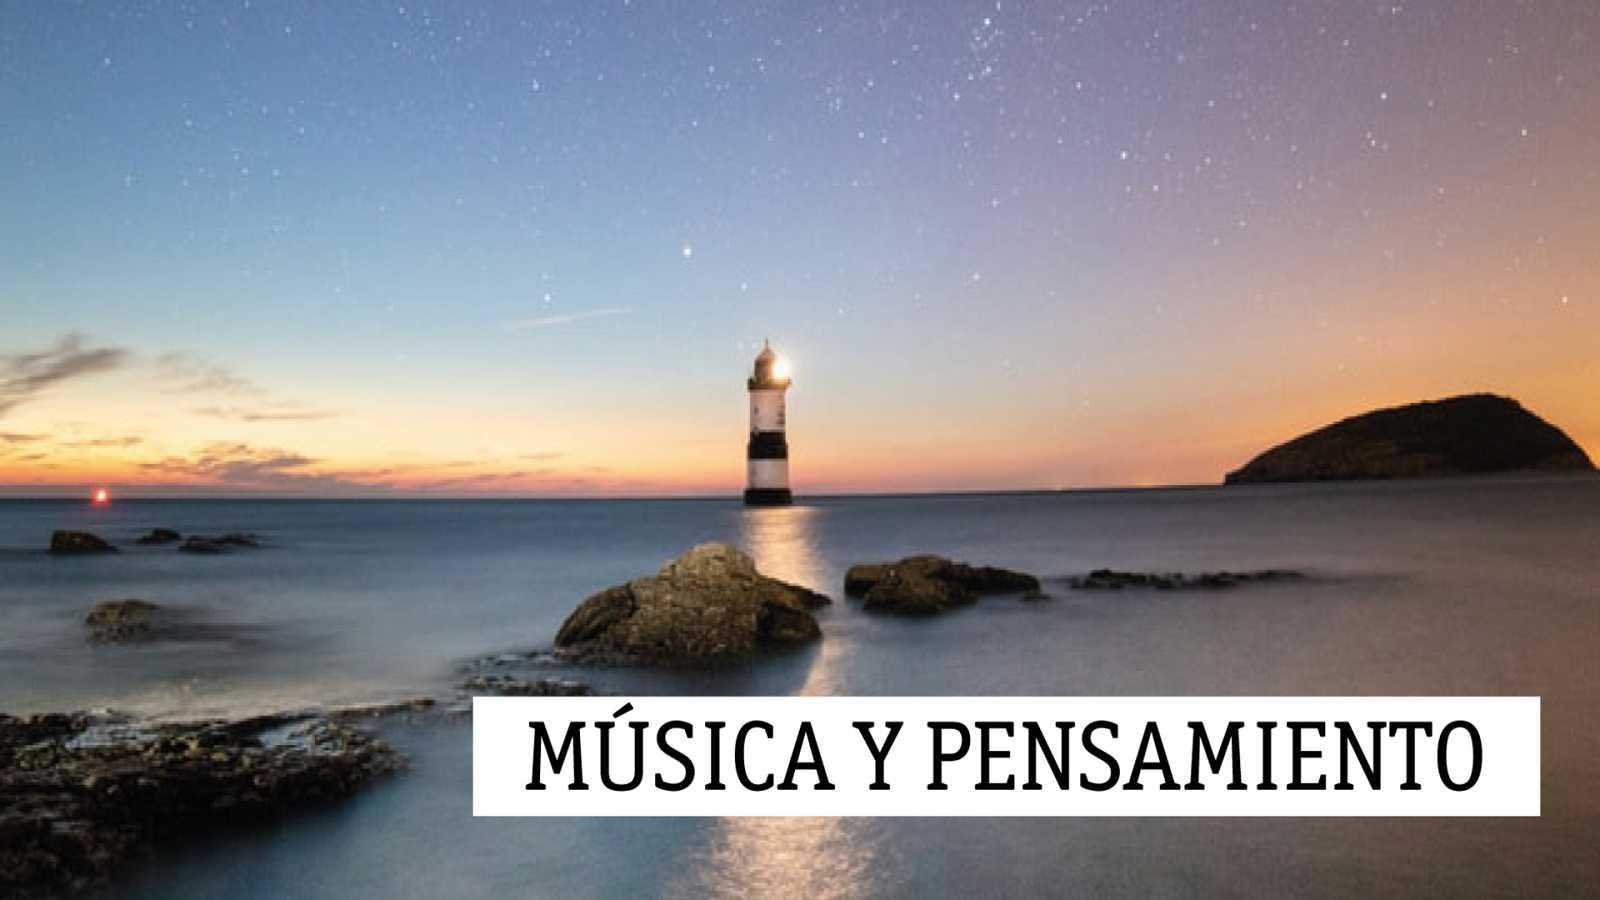 Música y pensamiento - Friedrich Schlegel - 01/11/20 - escuchar ahora